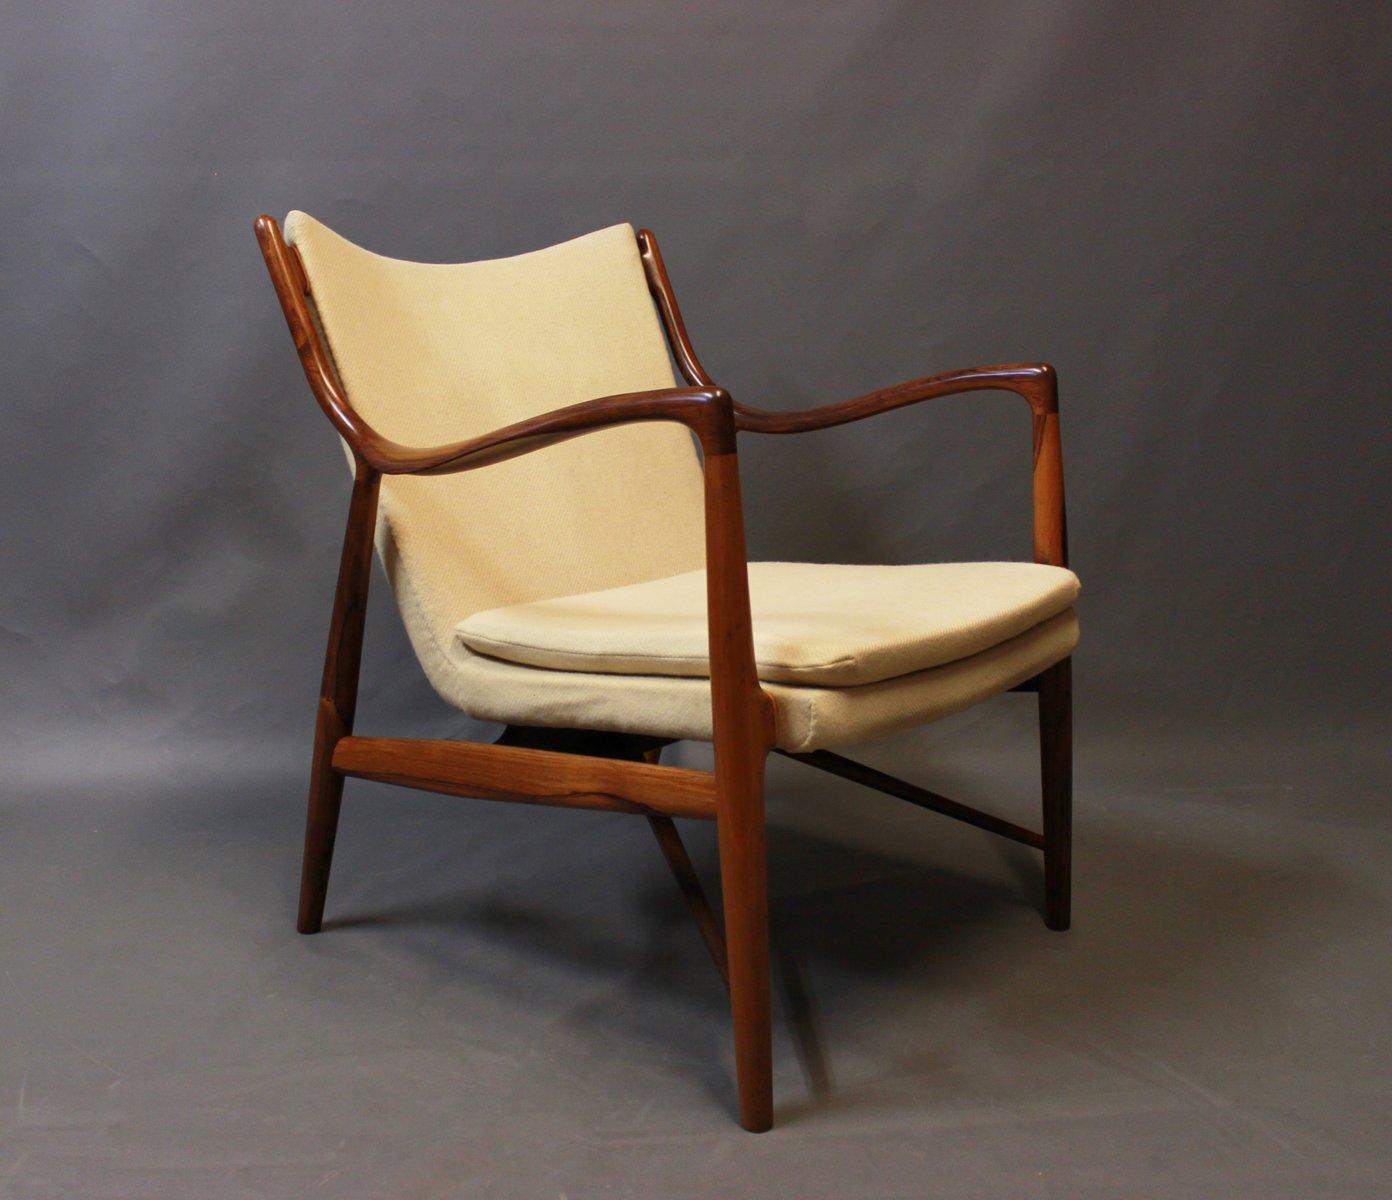 finn juhl chair price finn juhl chieftain chair 1950 1959 available